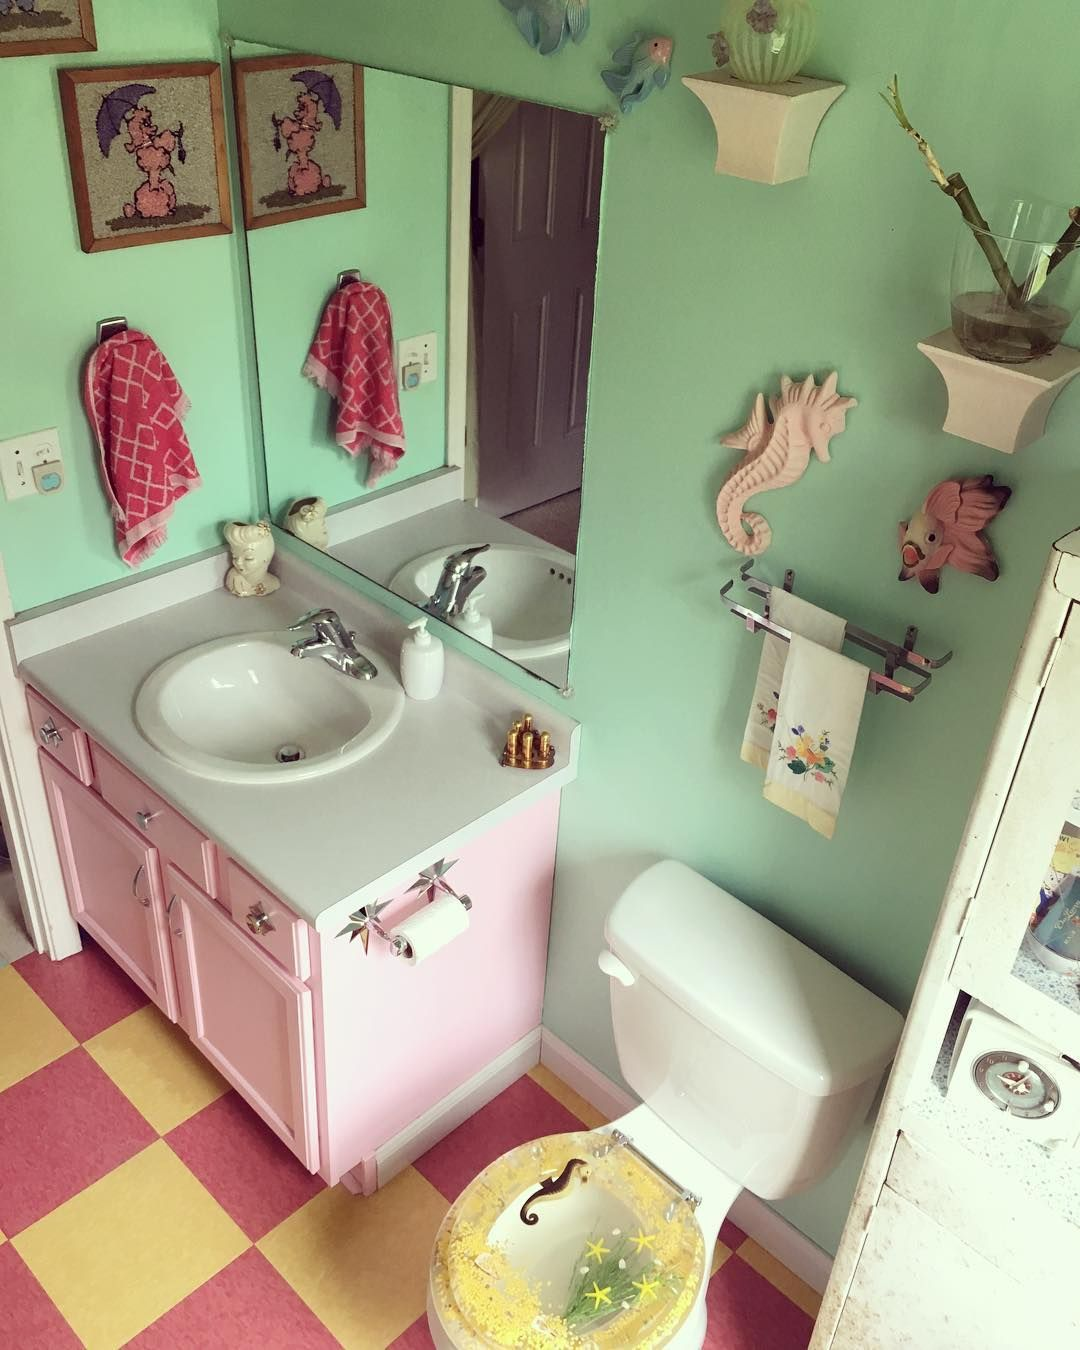 Kitsch Vibes Today Vintageview Kitschybathroom Instagram Mistysnow8 Retro Bathrooms 1950s Bathroom Kitsch Decor